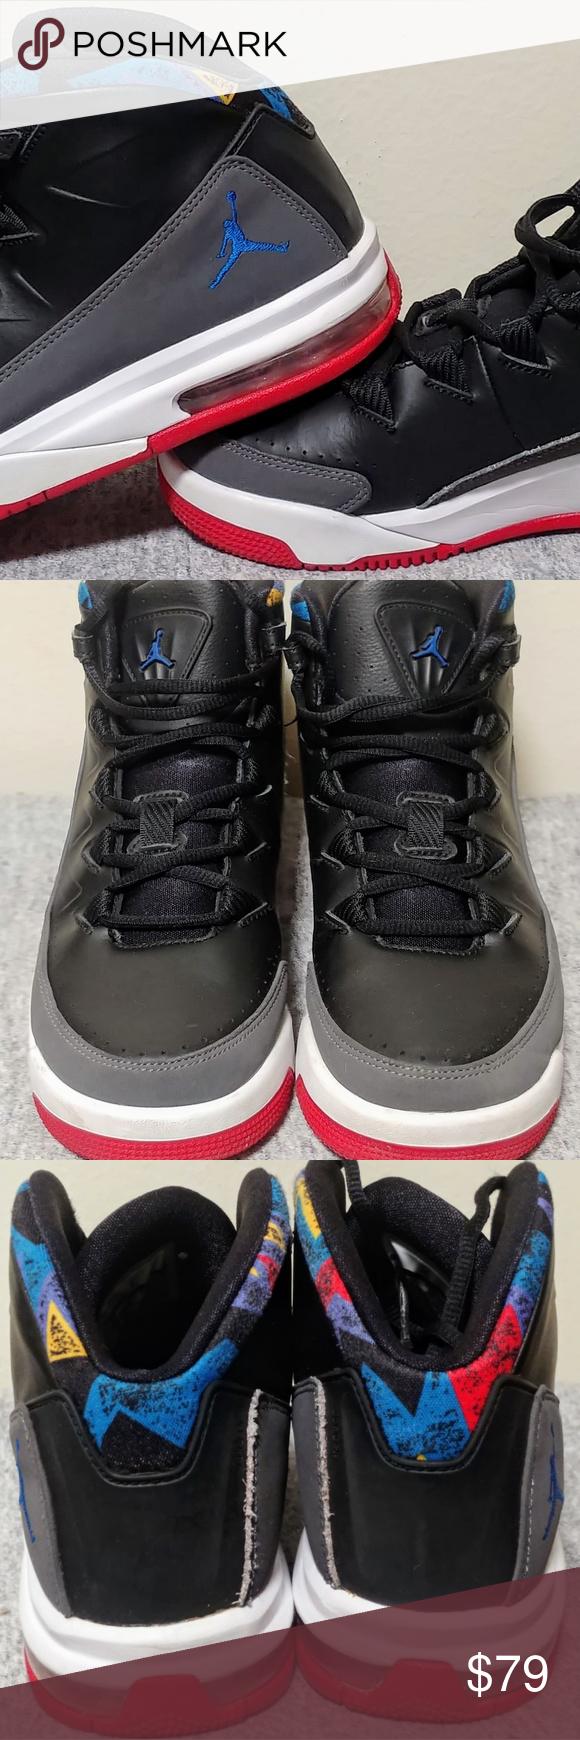 new style 5538b eeb93 I just added this listing on Poshmark  New Nike Air Jordan AJ Deluxe size  6.5 sneakers.  shopmycloset  poshmark  fashion  shopping  style  forsale   Nike   ...